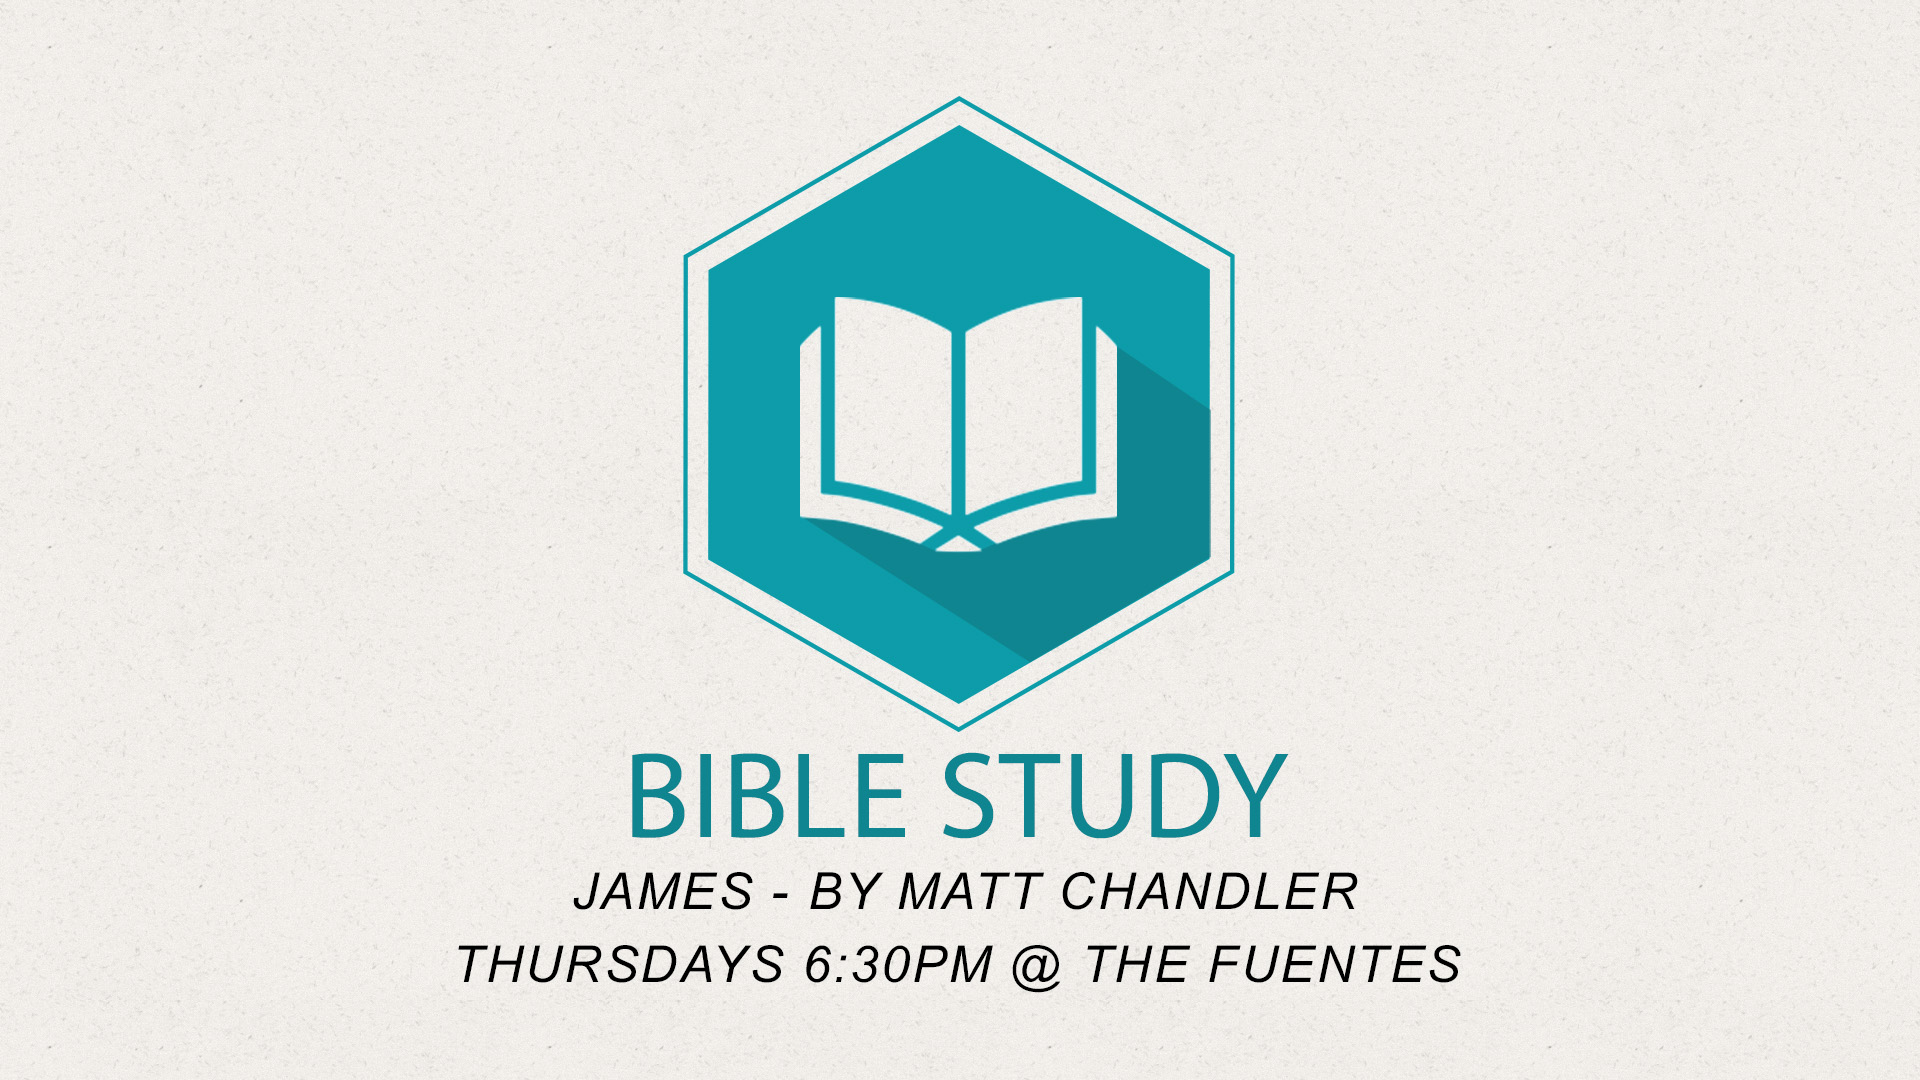 Bible Study james chandler.jpg